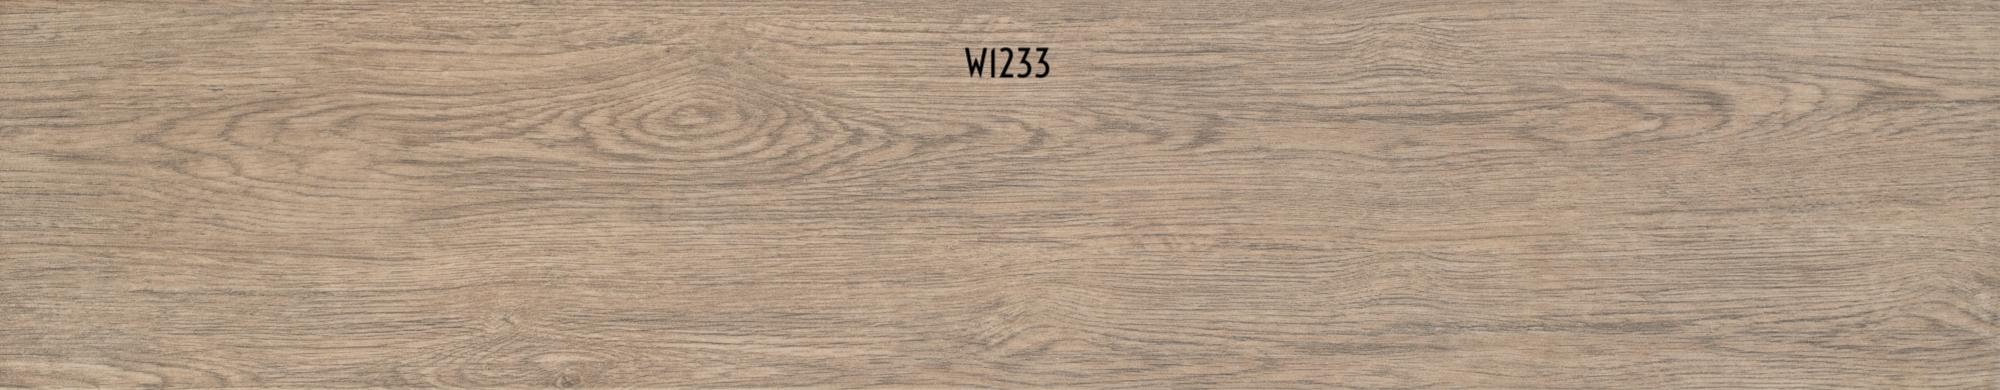 W1233